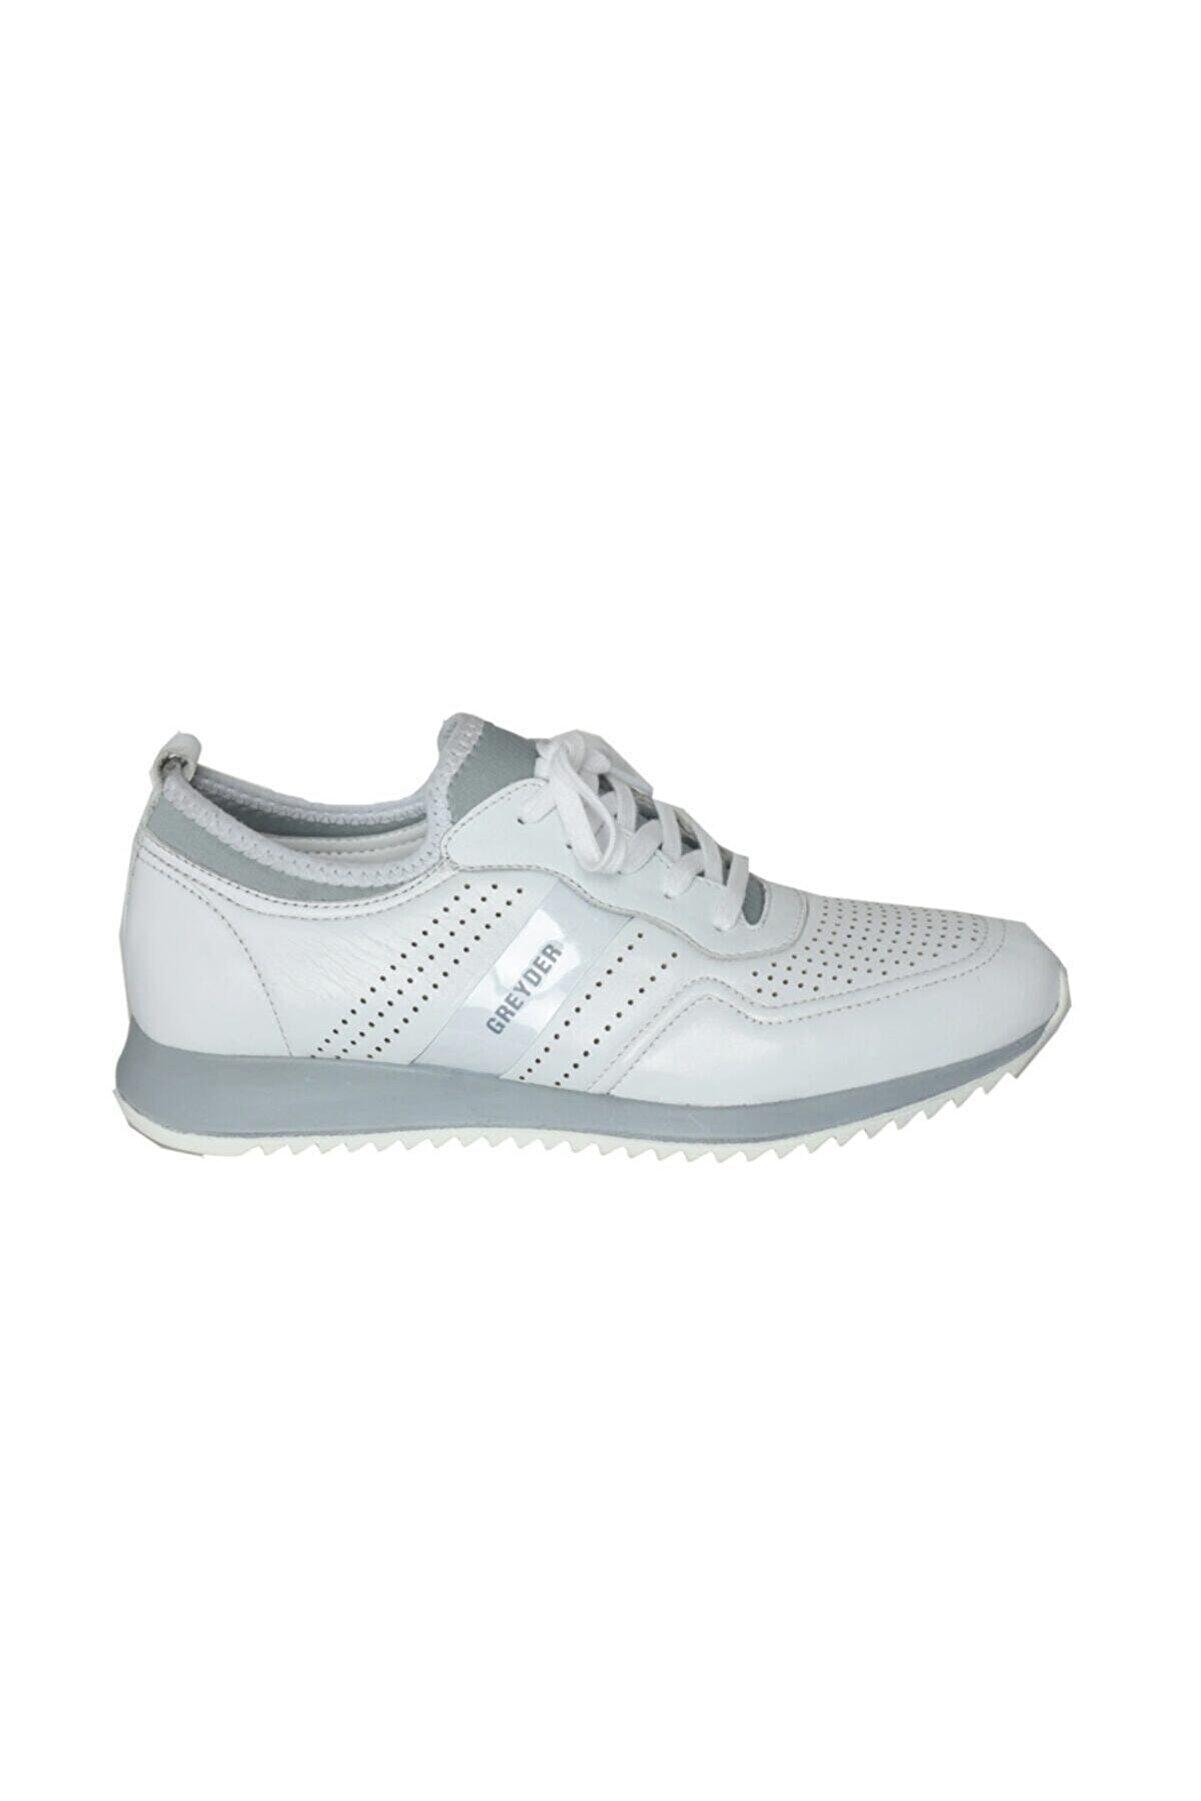 Greyder Erkek Beyaz-Grı Sneaker 0Y1SA67531